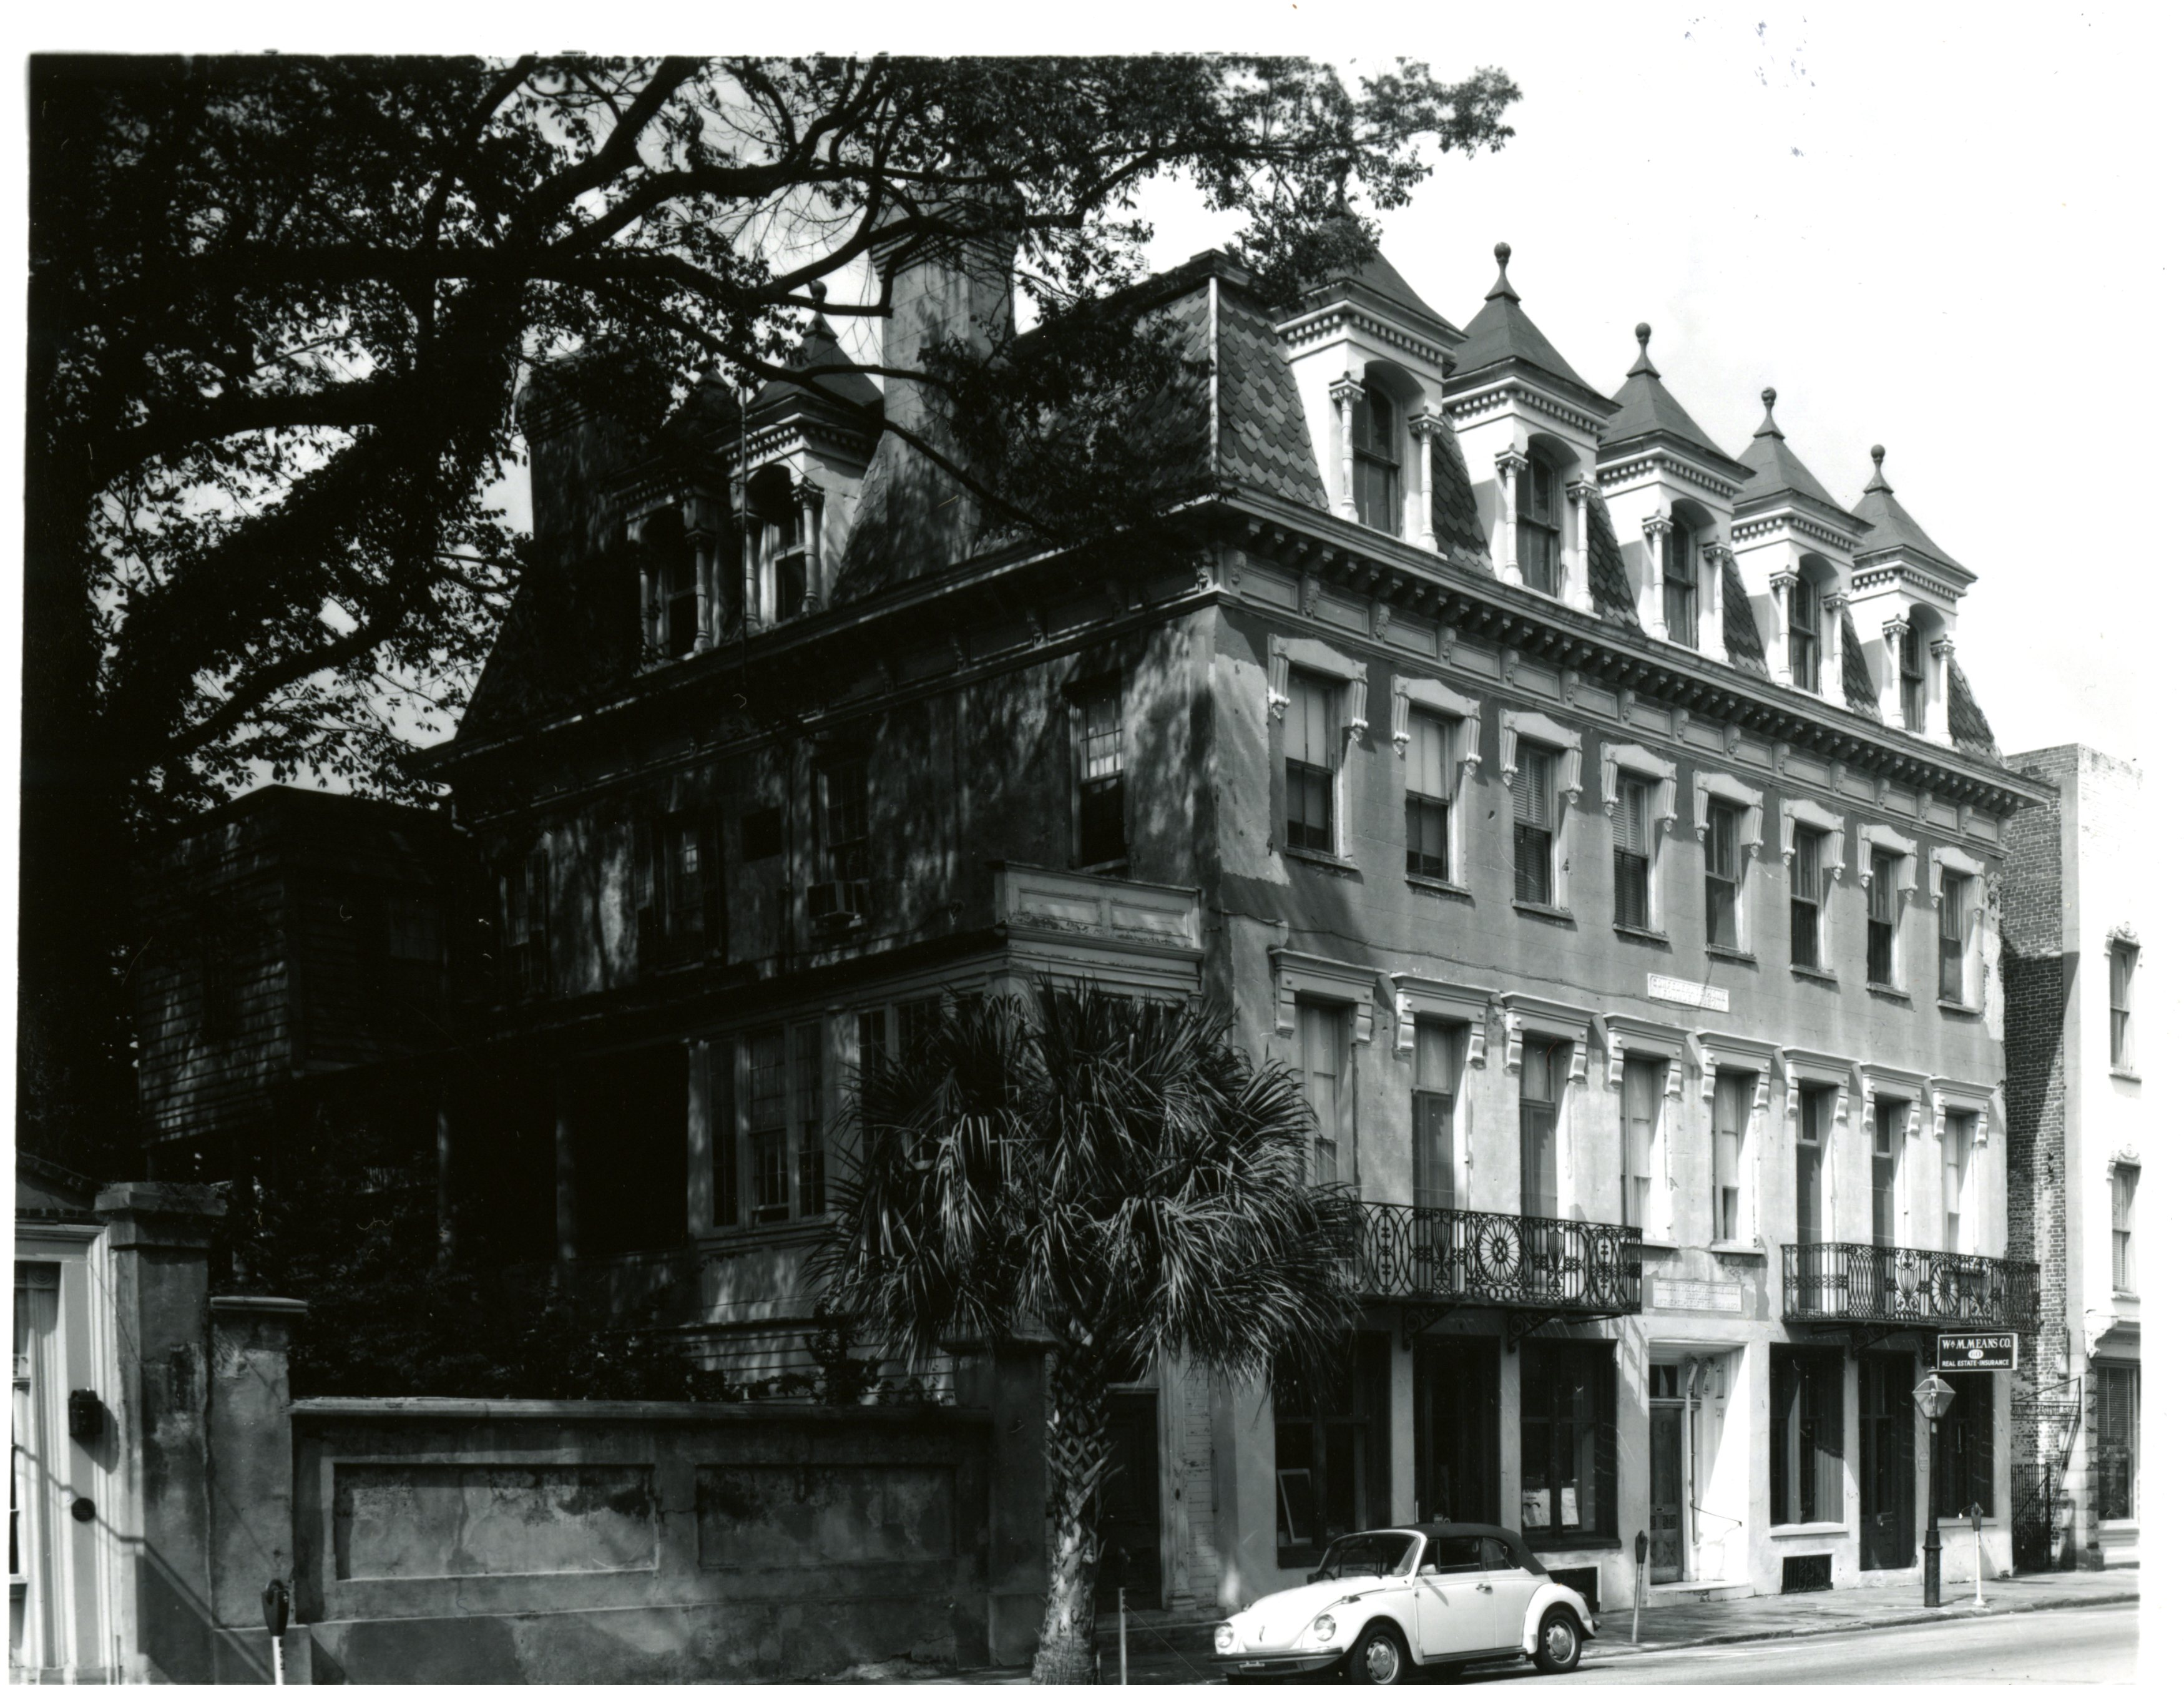 62 Broad Street